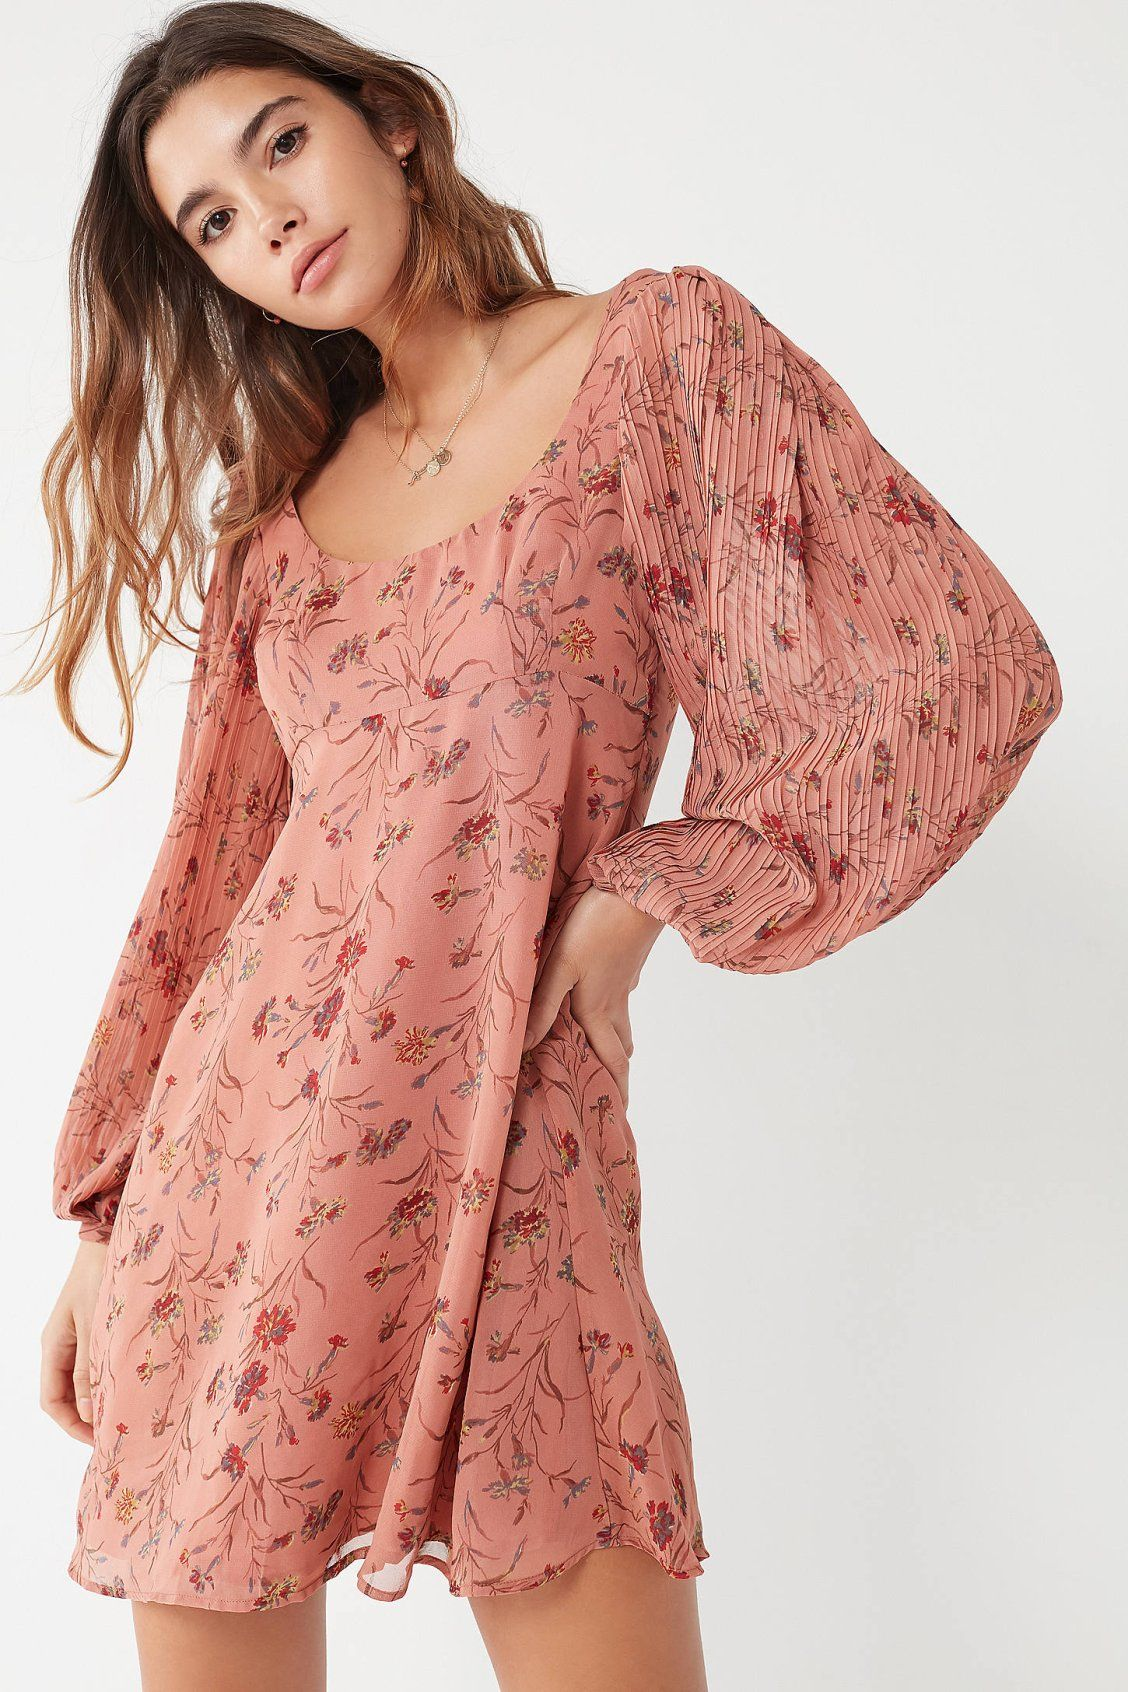 Uo persephone pleated sleeve mini dress urban outfitters mini